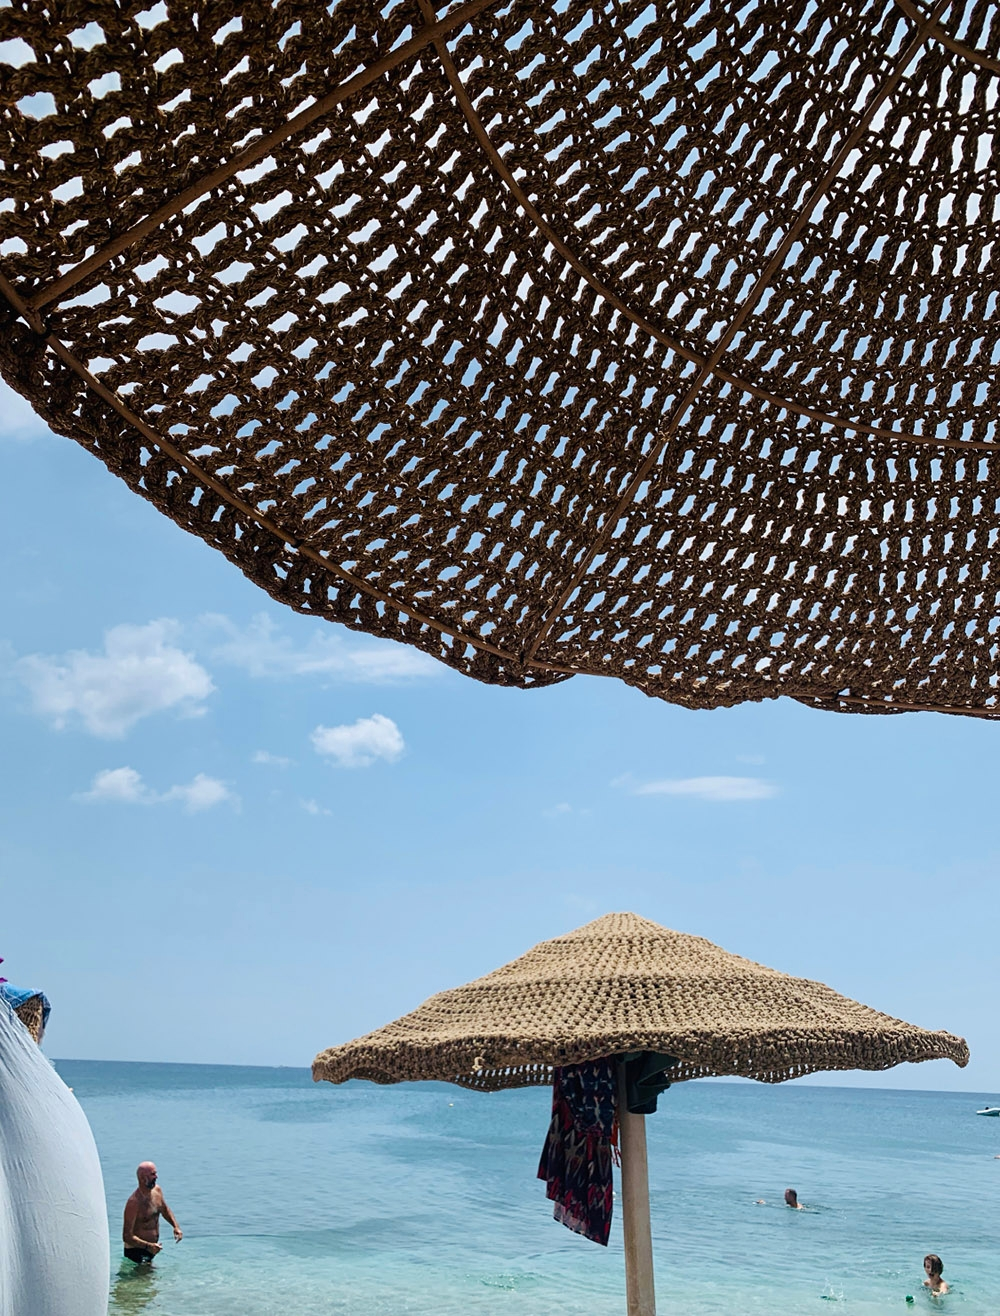 Laying under a beach umbrella facing the clear ocean.